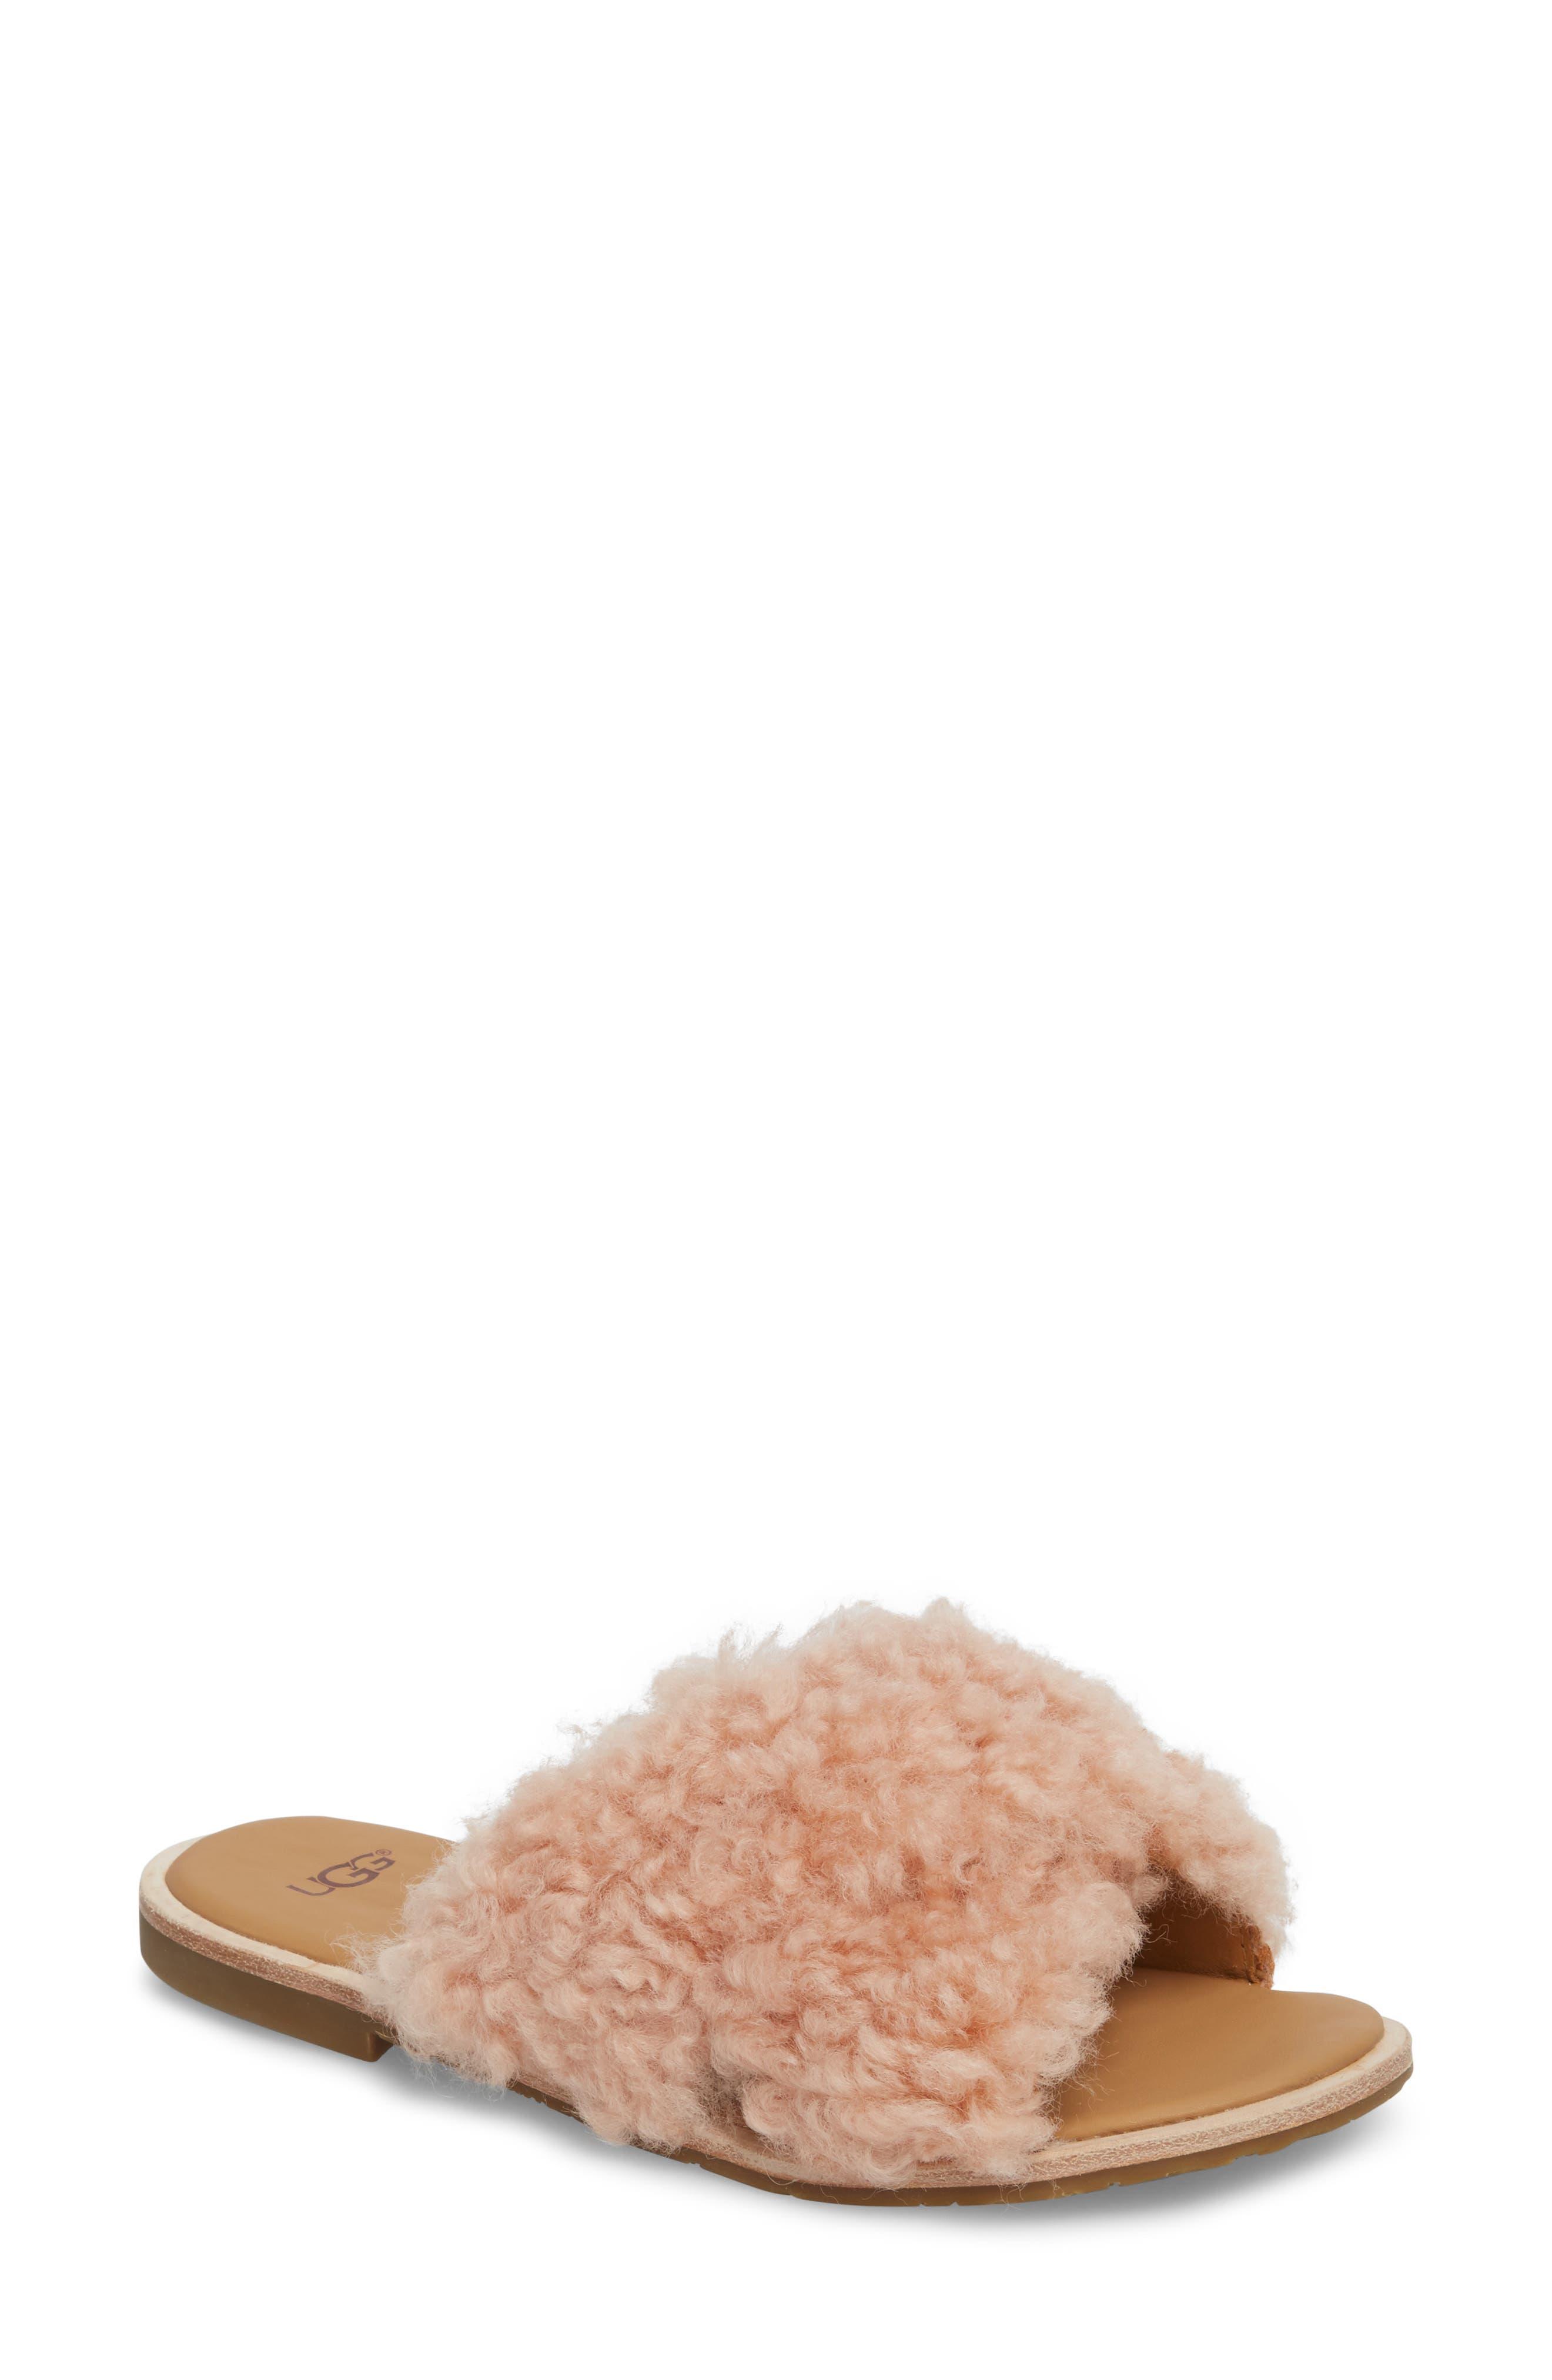 Joni Genuine Shearling Slide Sandal,                         Main,                         color, Suntan